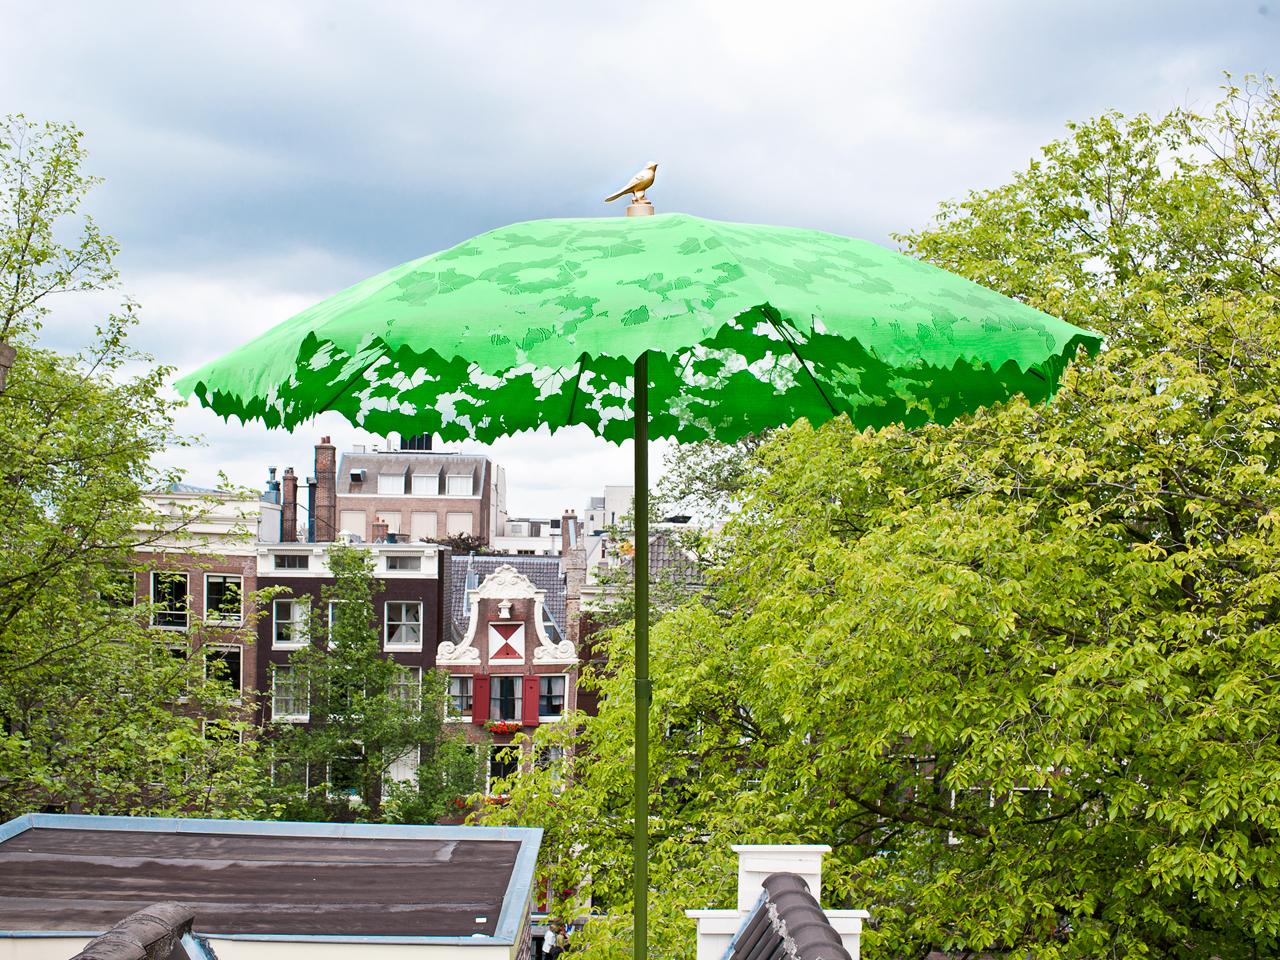 12 Modern Umbrellas We'd Be Happy to Sit Under